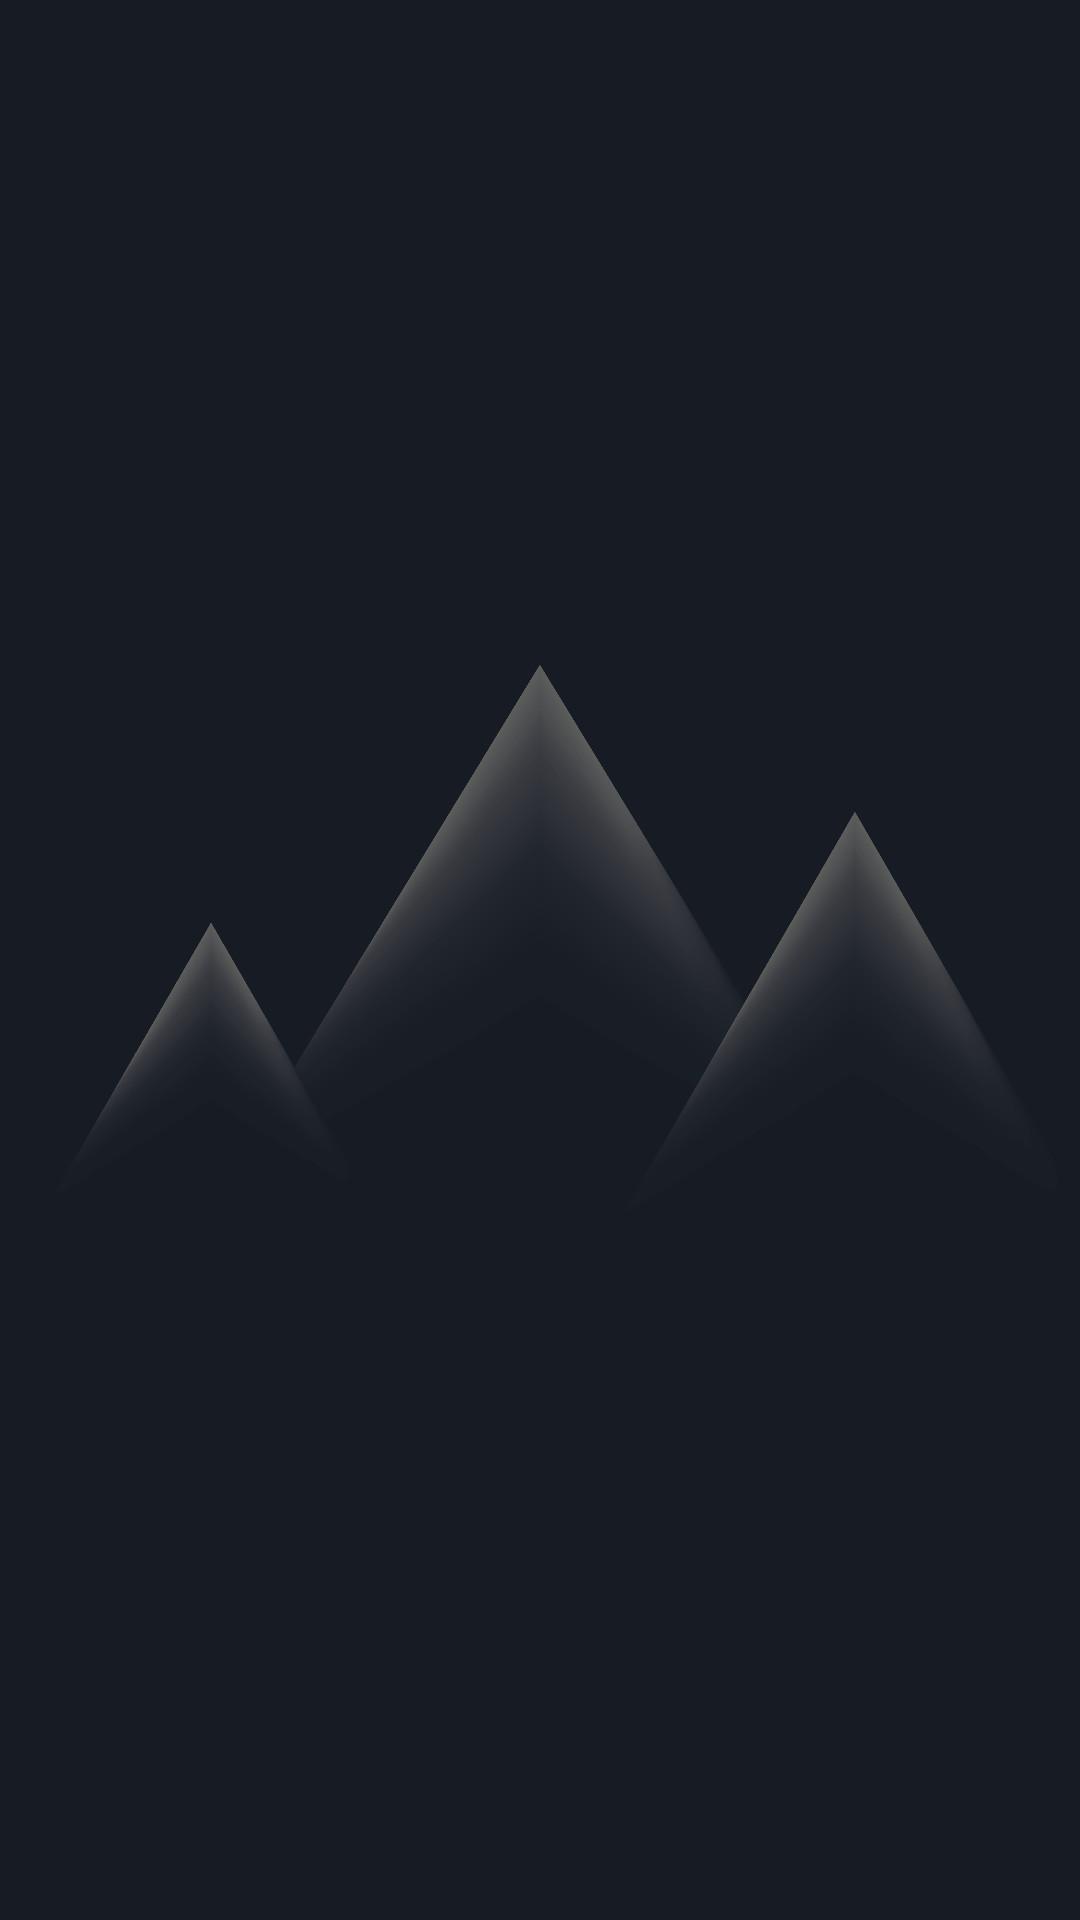 minimalistic mountain peaks minimalistic mobile wallpaper